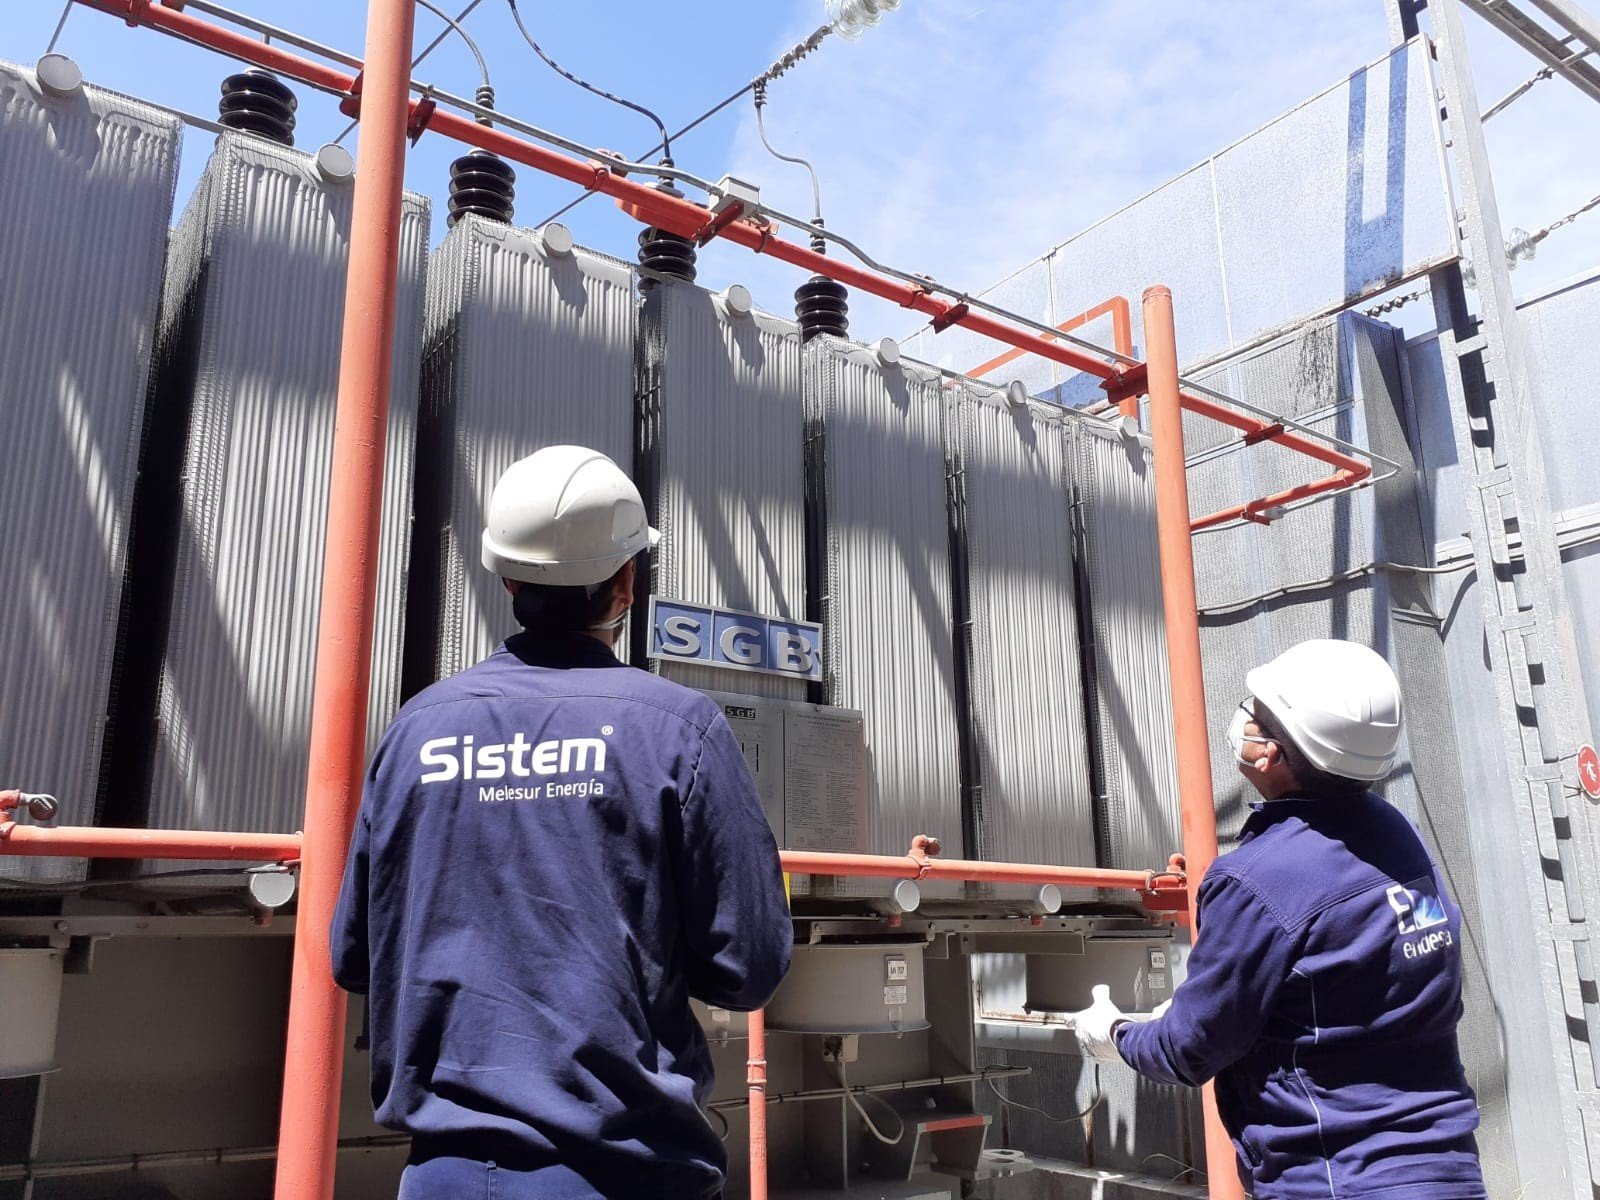 Un fallo en la subestación eléctrica que da suministro al centro de Granada afecta a miles de usuarios